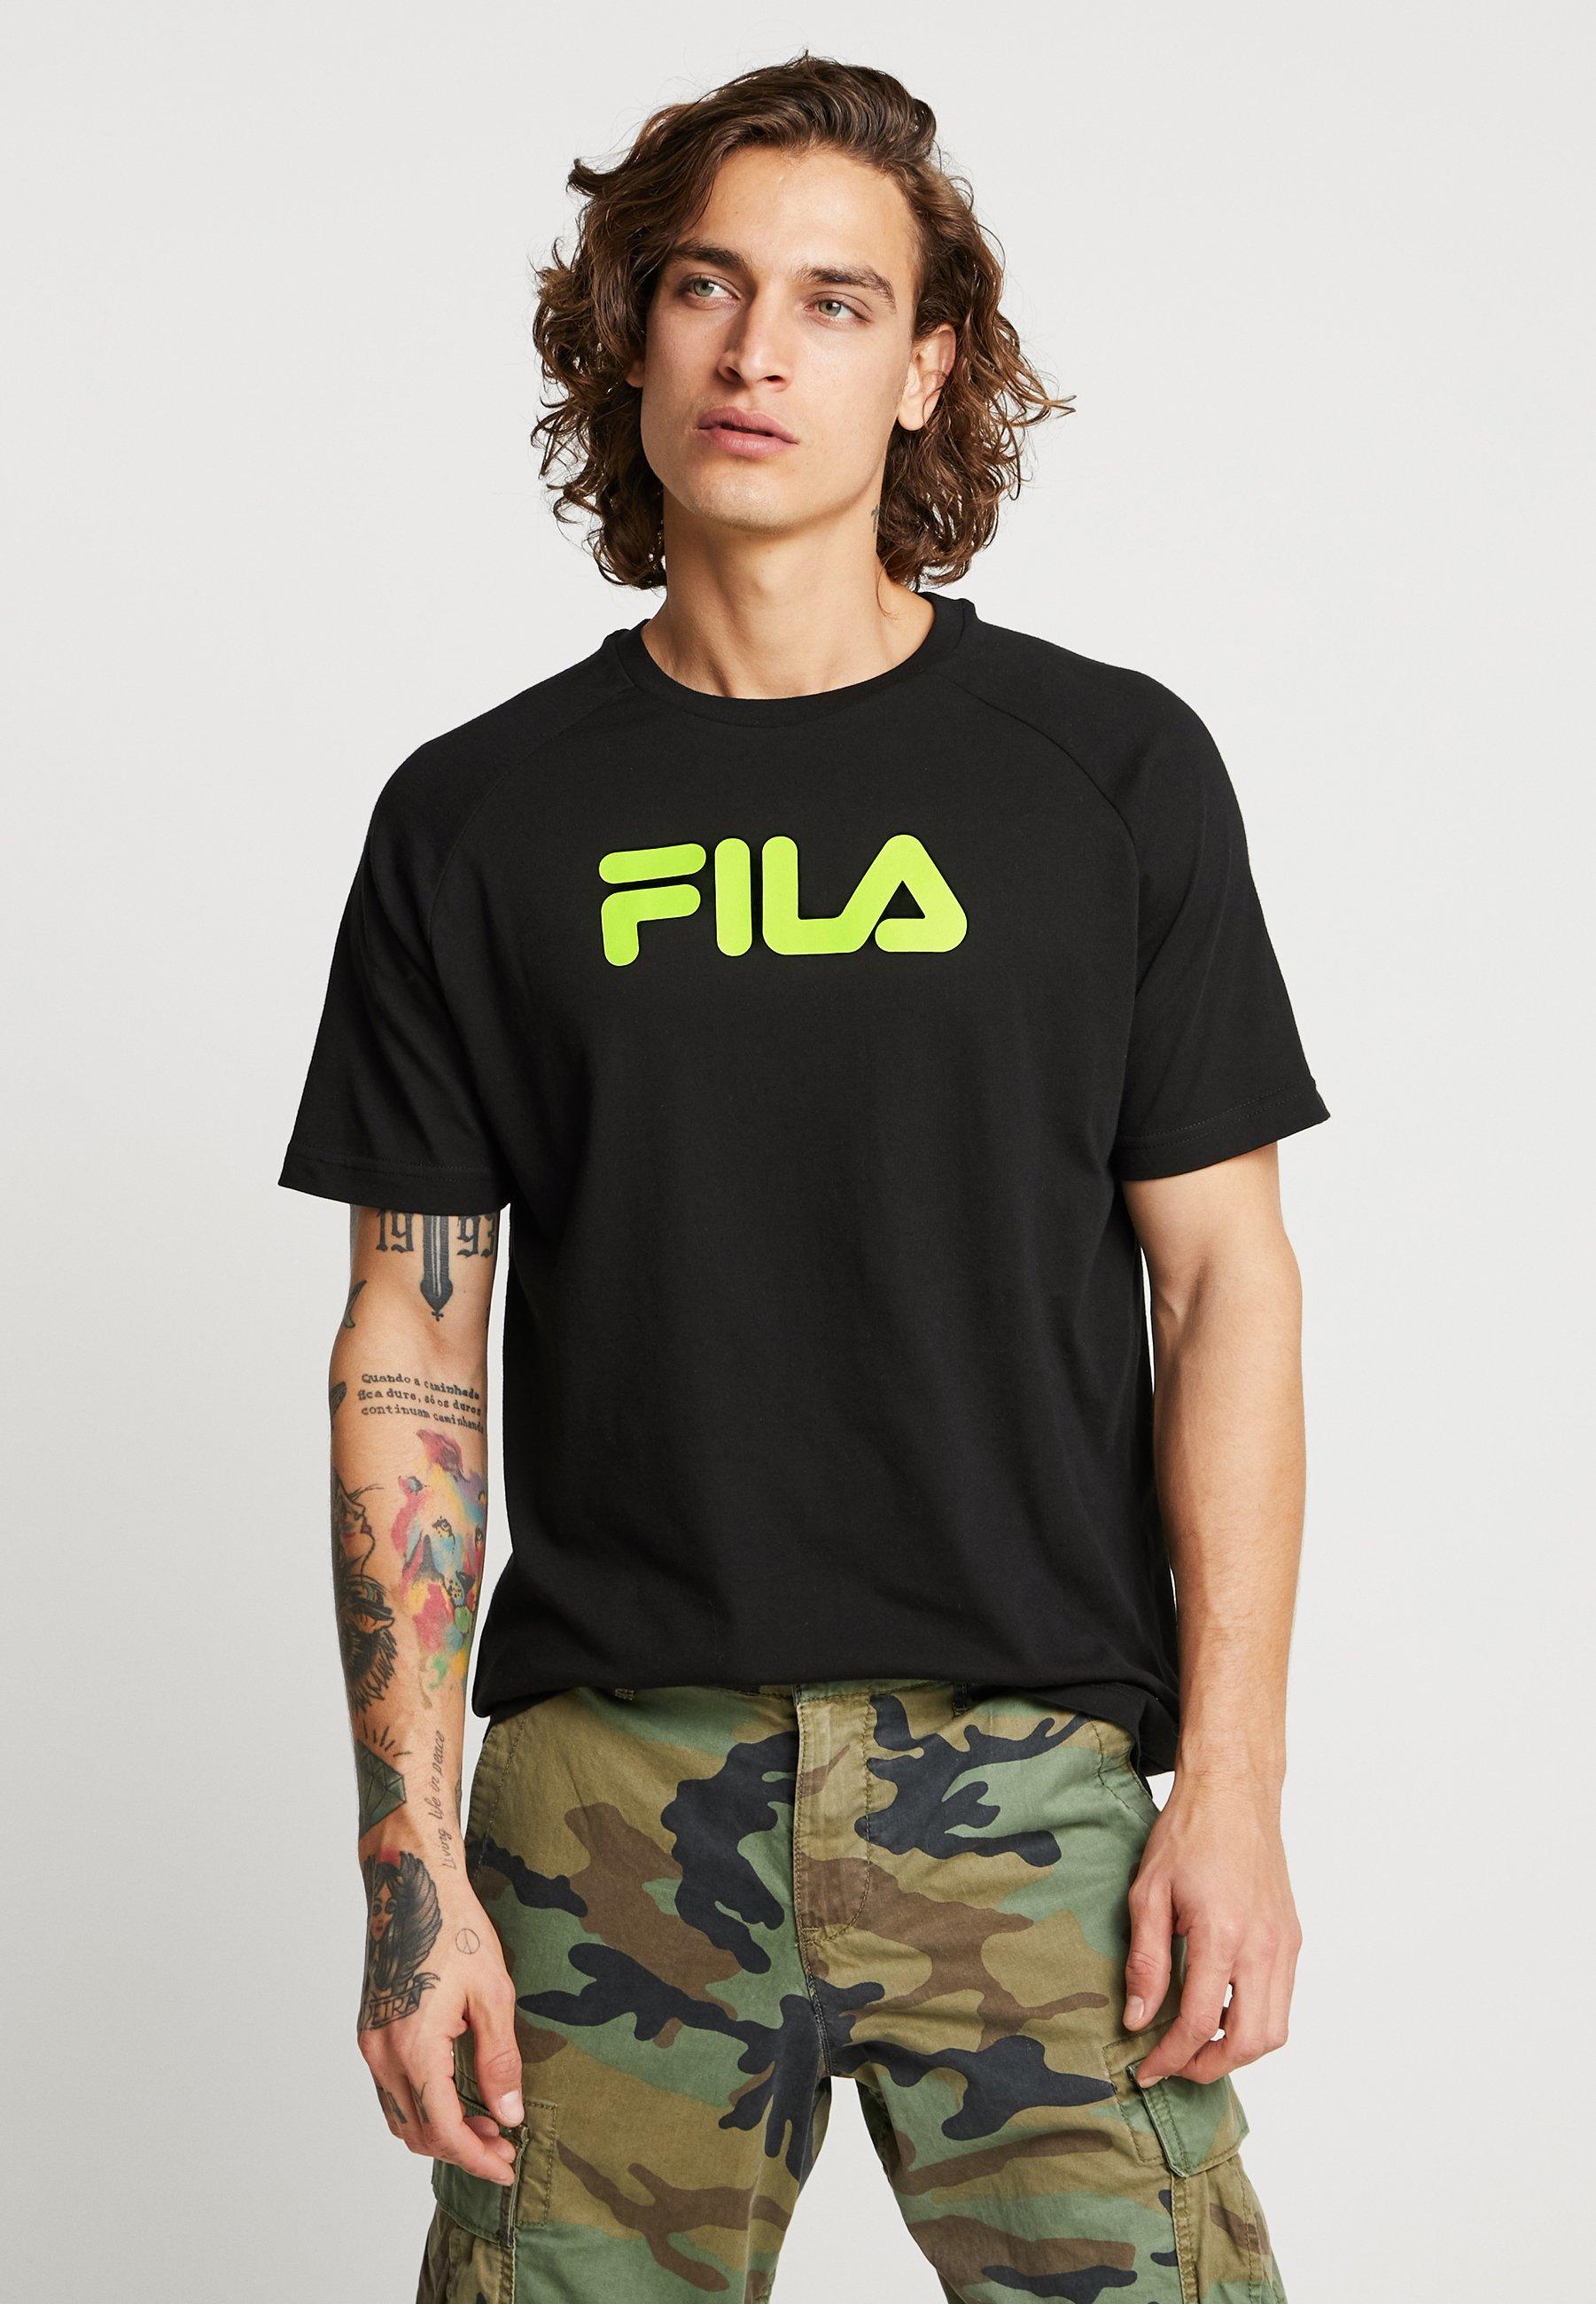 Fila Gary Raglan Imprimé TeeT Black shirt Yf7ymbvIg6